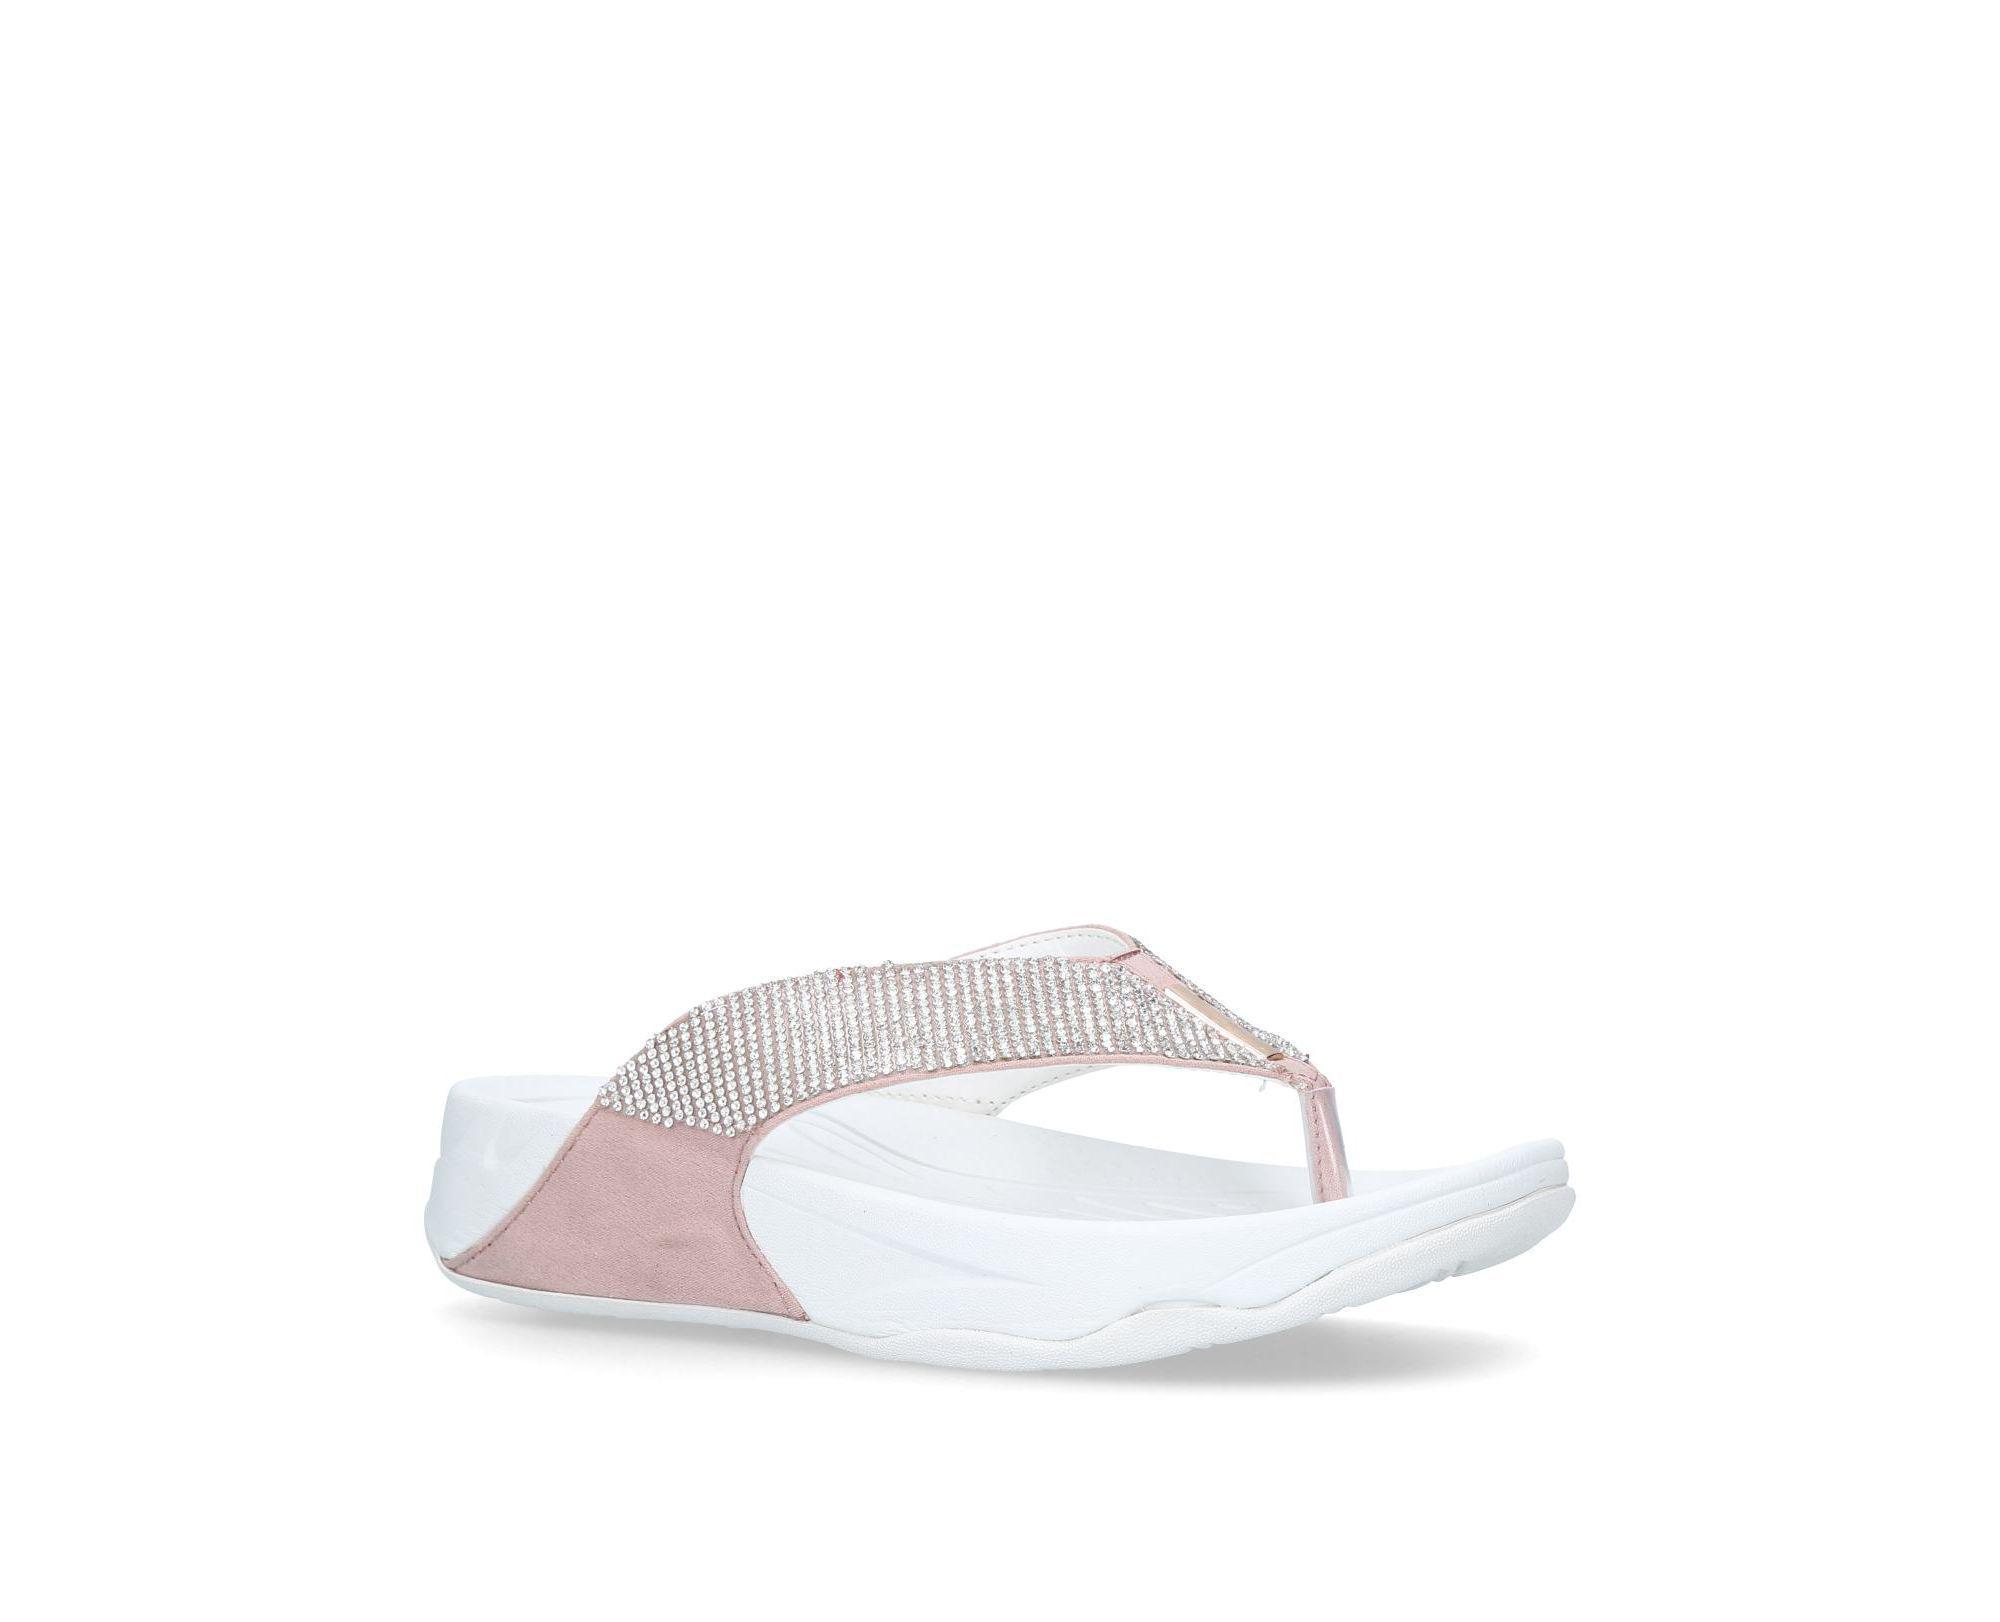 f176c5558 Carvela Kurt Geiger Nude  sin  Flip Flops in White - Save 17% - Lyst